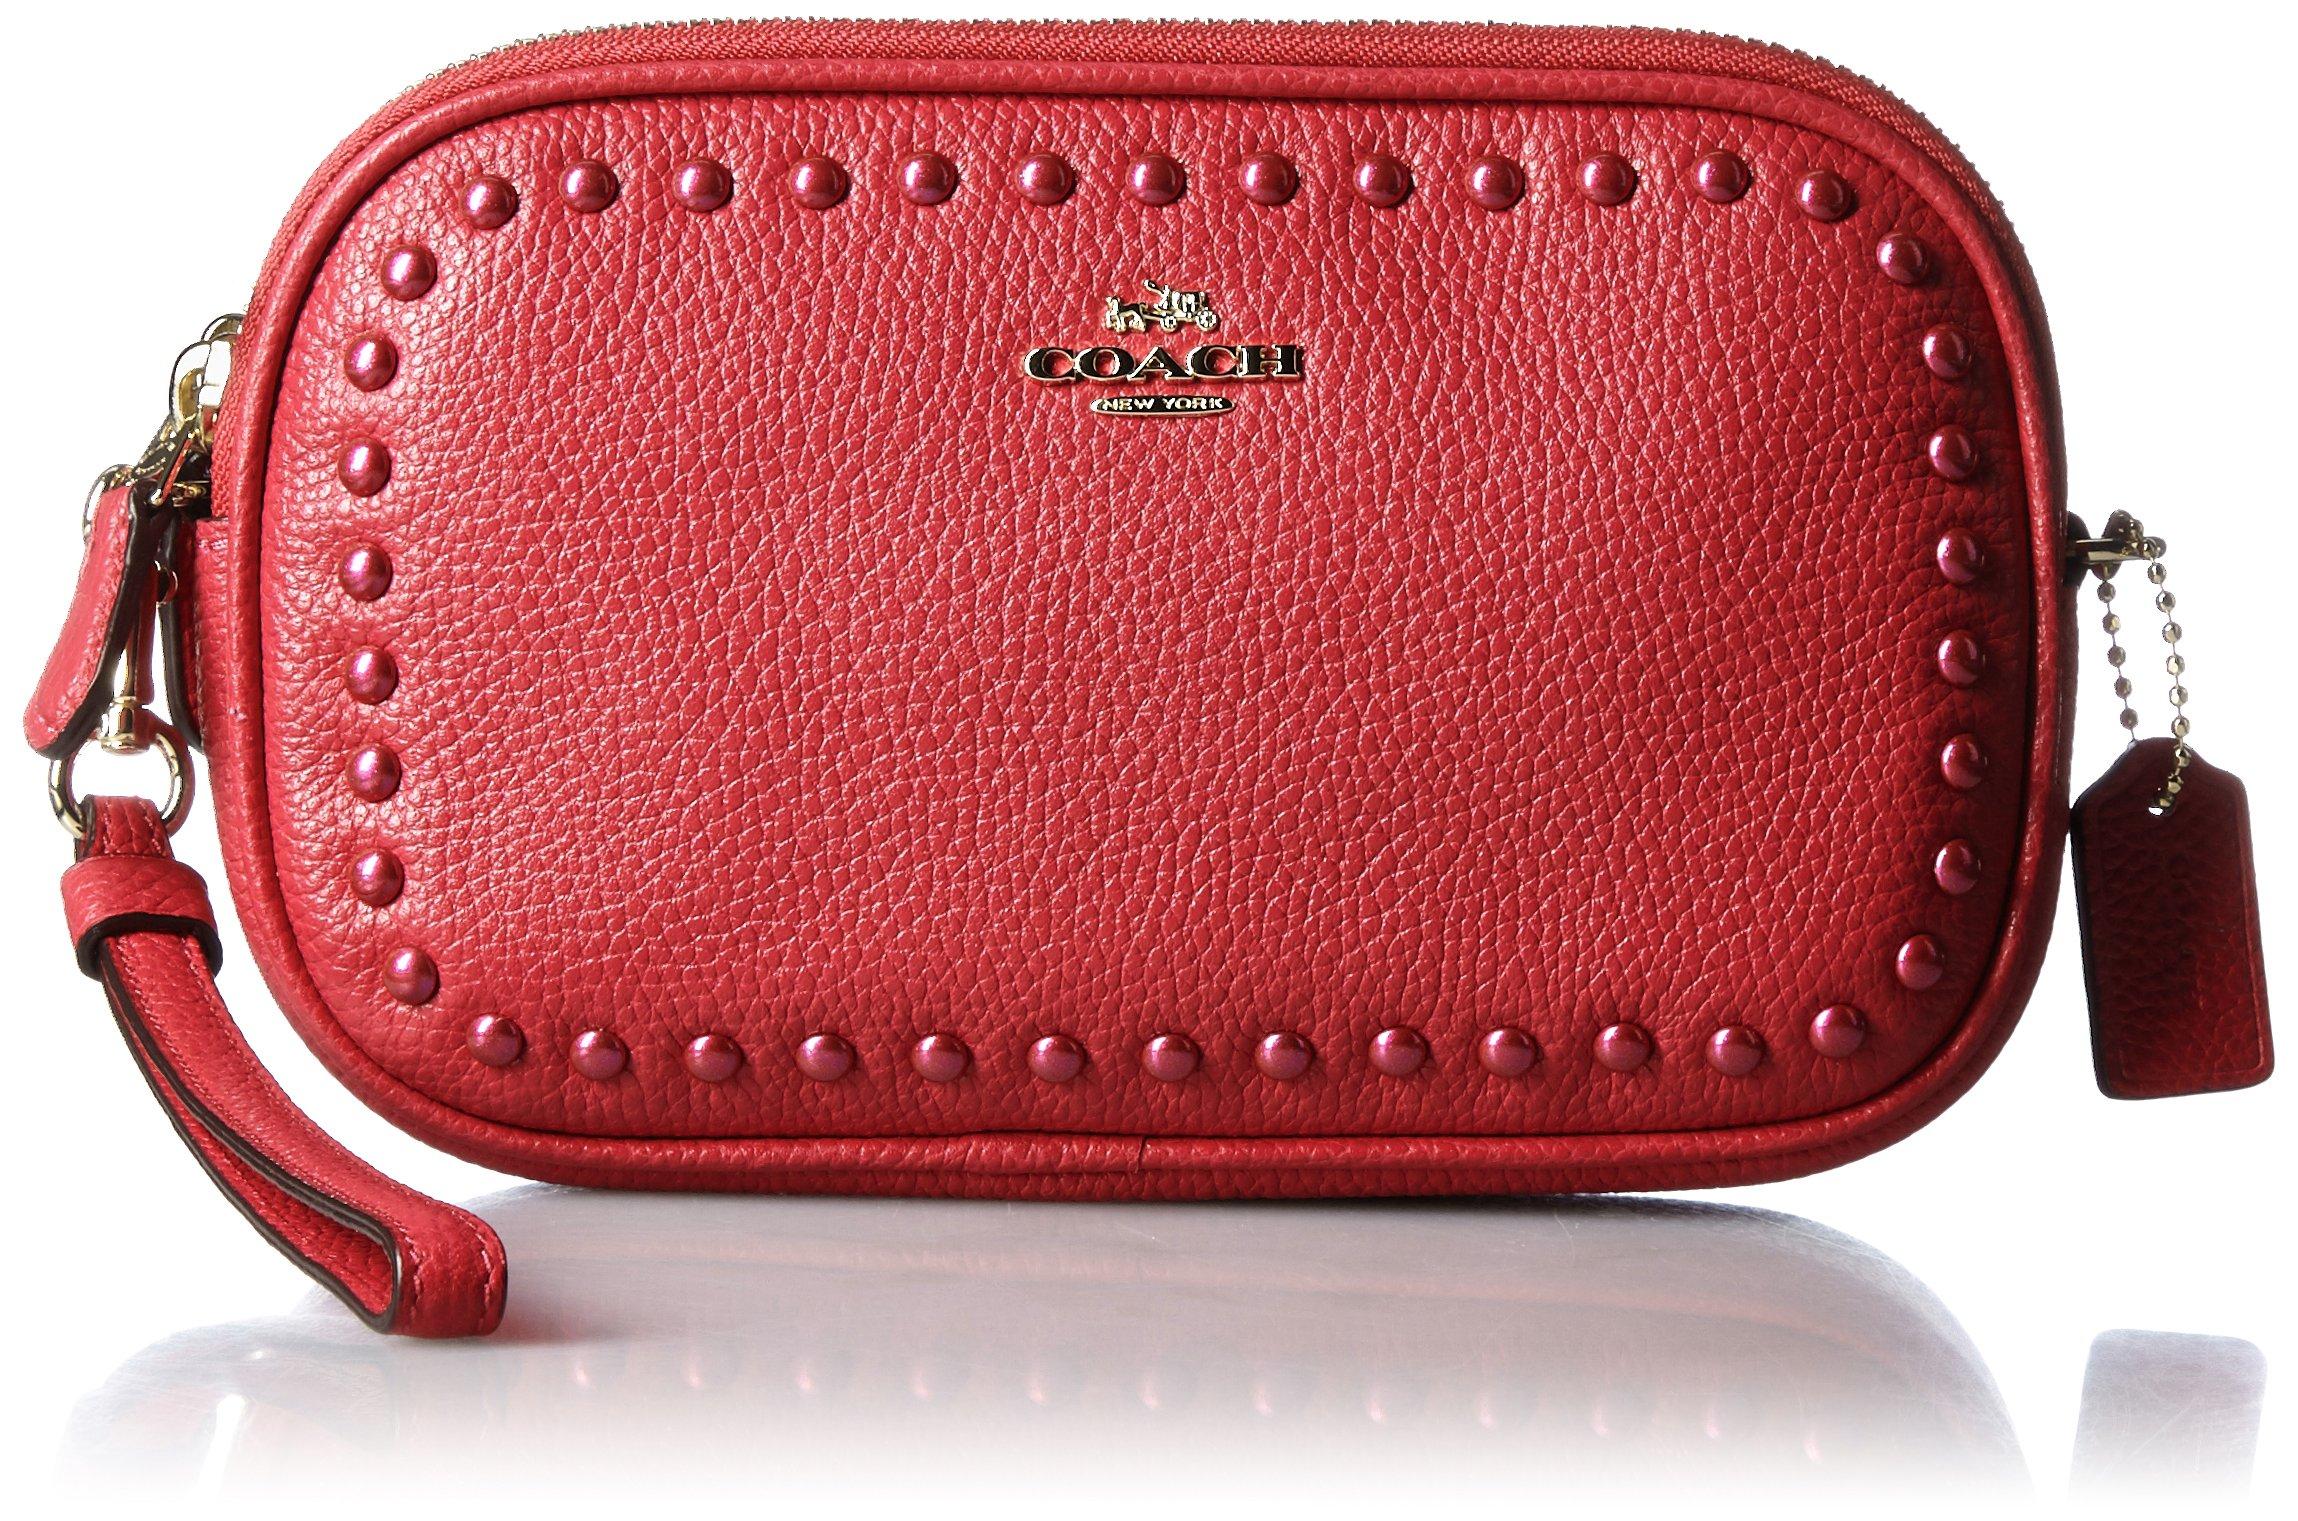 COACH Women's Lacquer Rivets Crossbody Clutch Red Currant Clutch